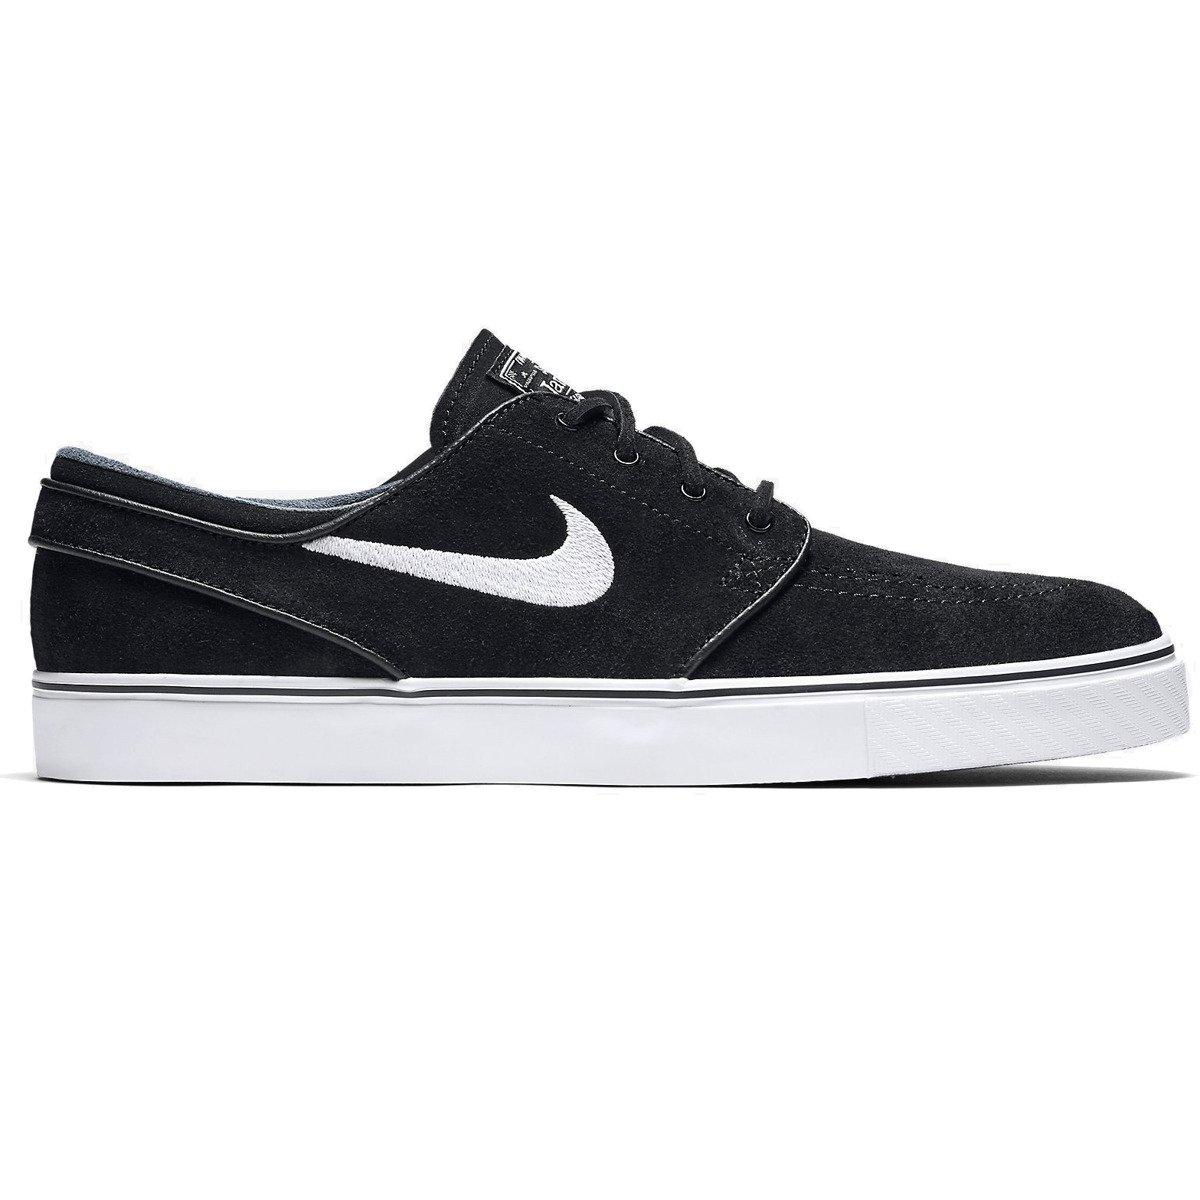 3c1da2b5 shoes Nike SB Air Zoom Stefan Janoski OG black/white-gum light brown Click  to zoom ...